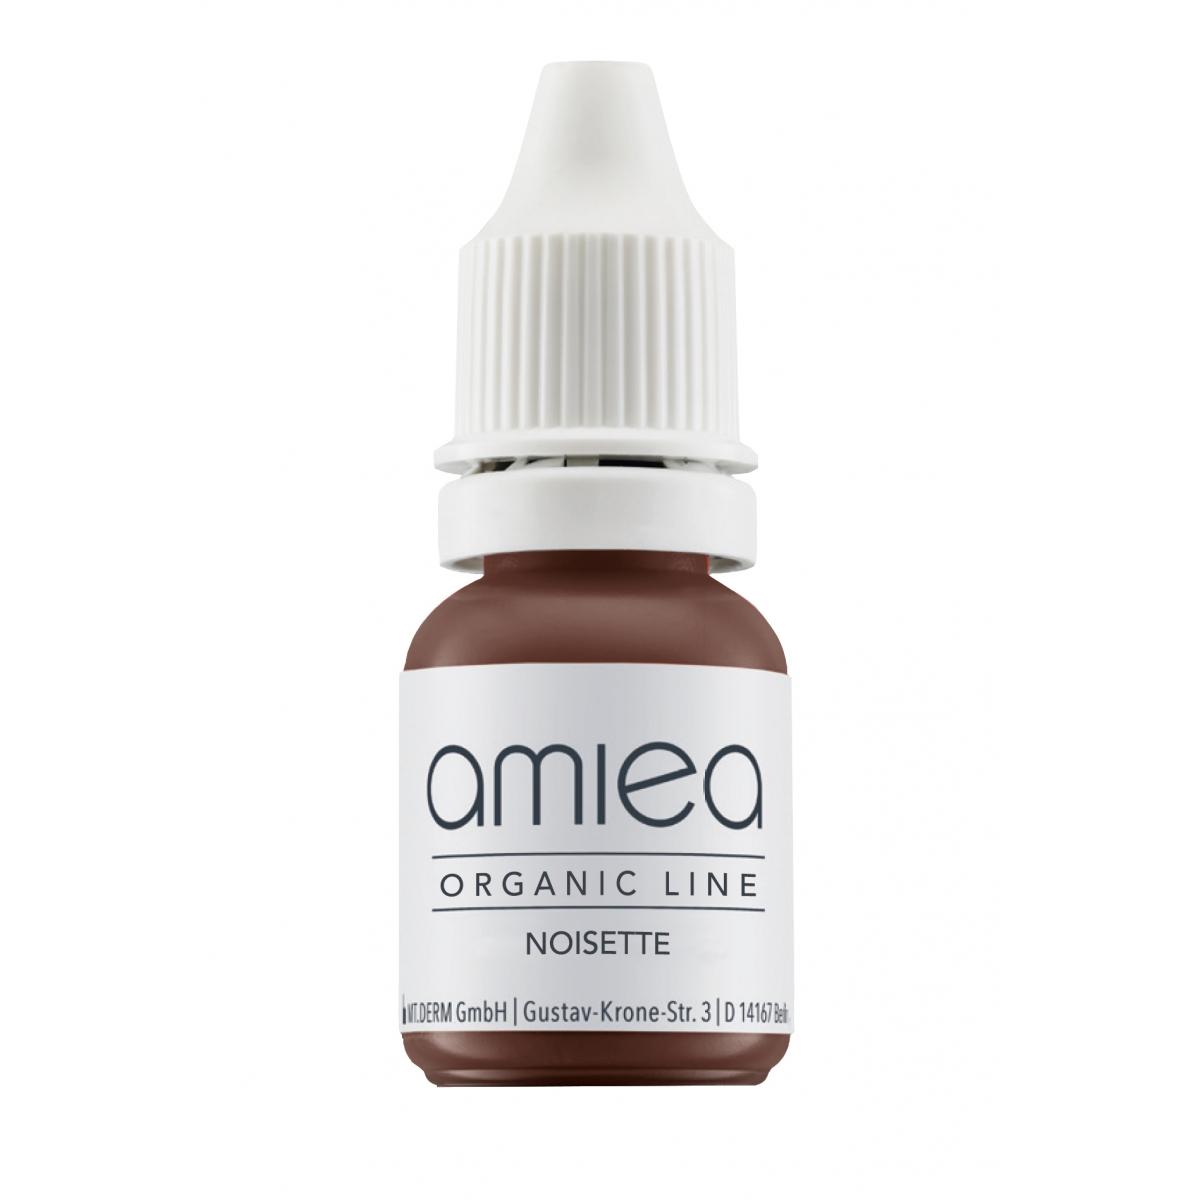 ORGANIC LINE (5ml)  - PIGMENT NOISETTE ORGANICLINE AMIEA (5 ml)